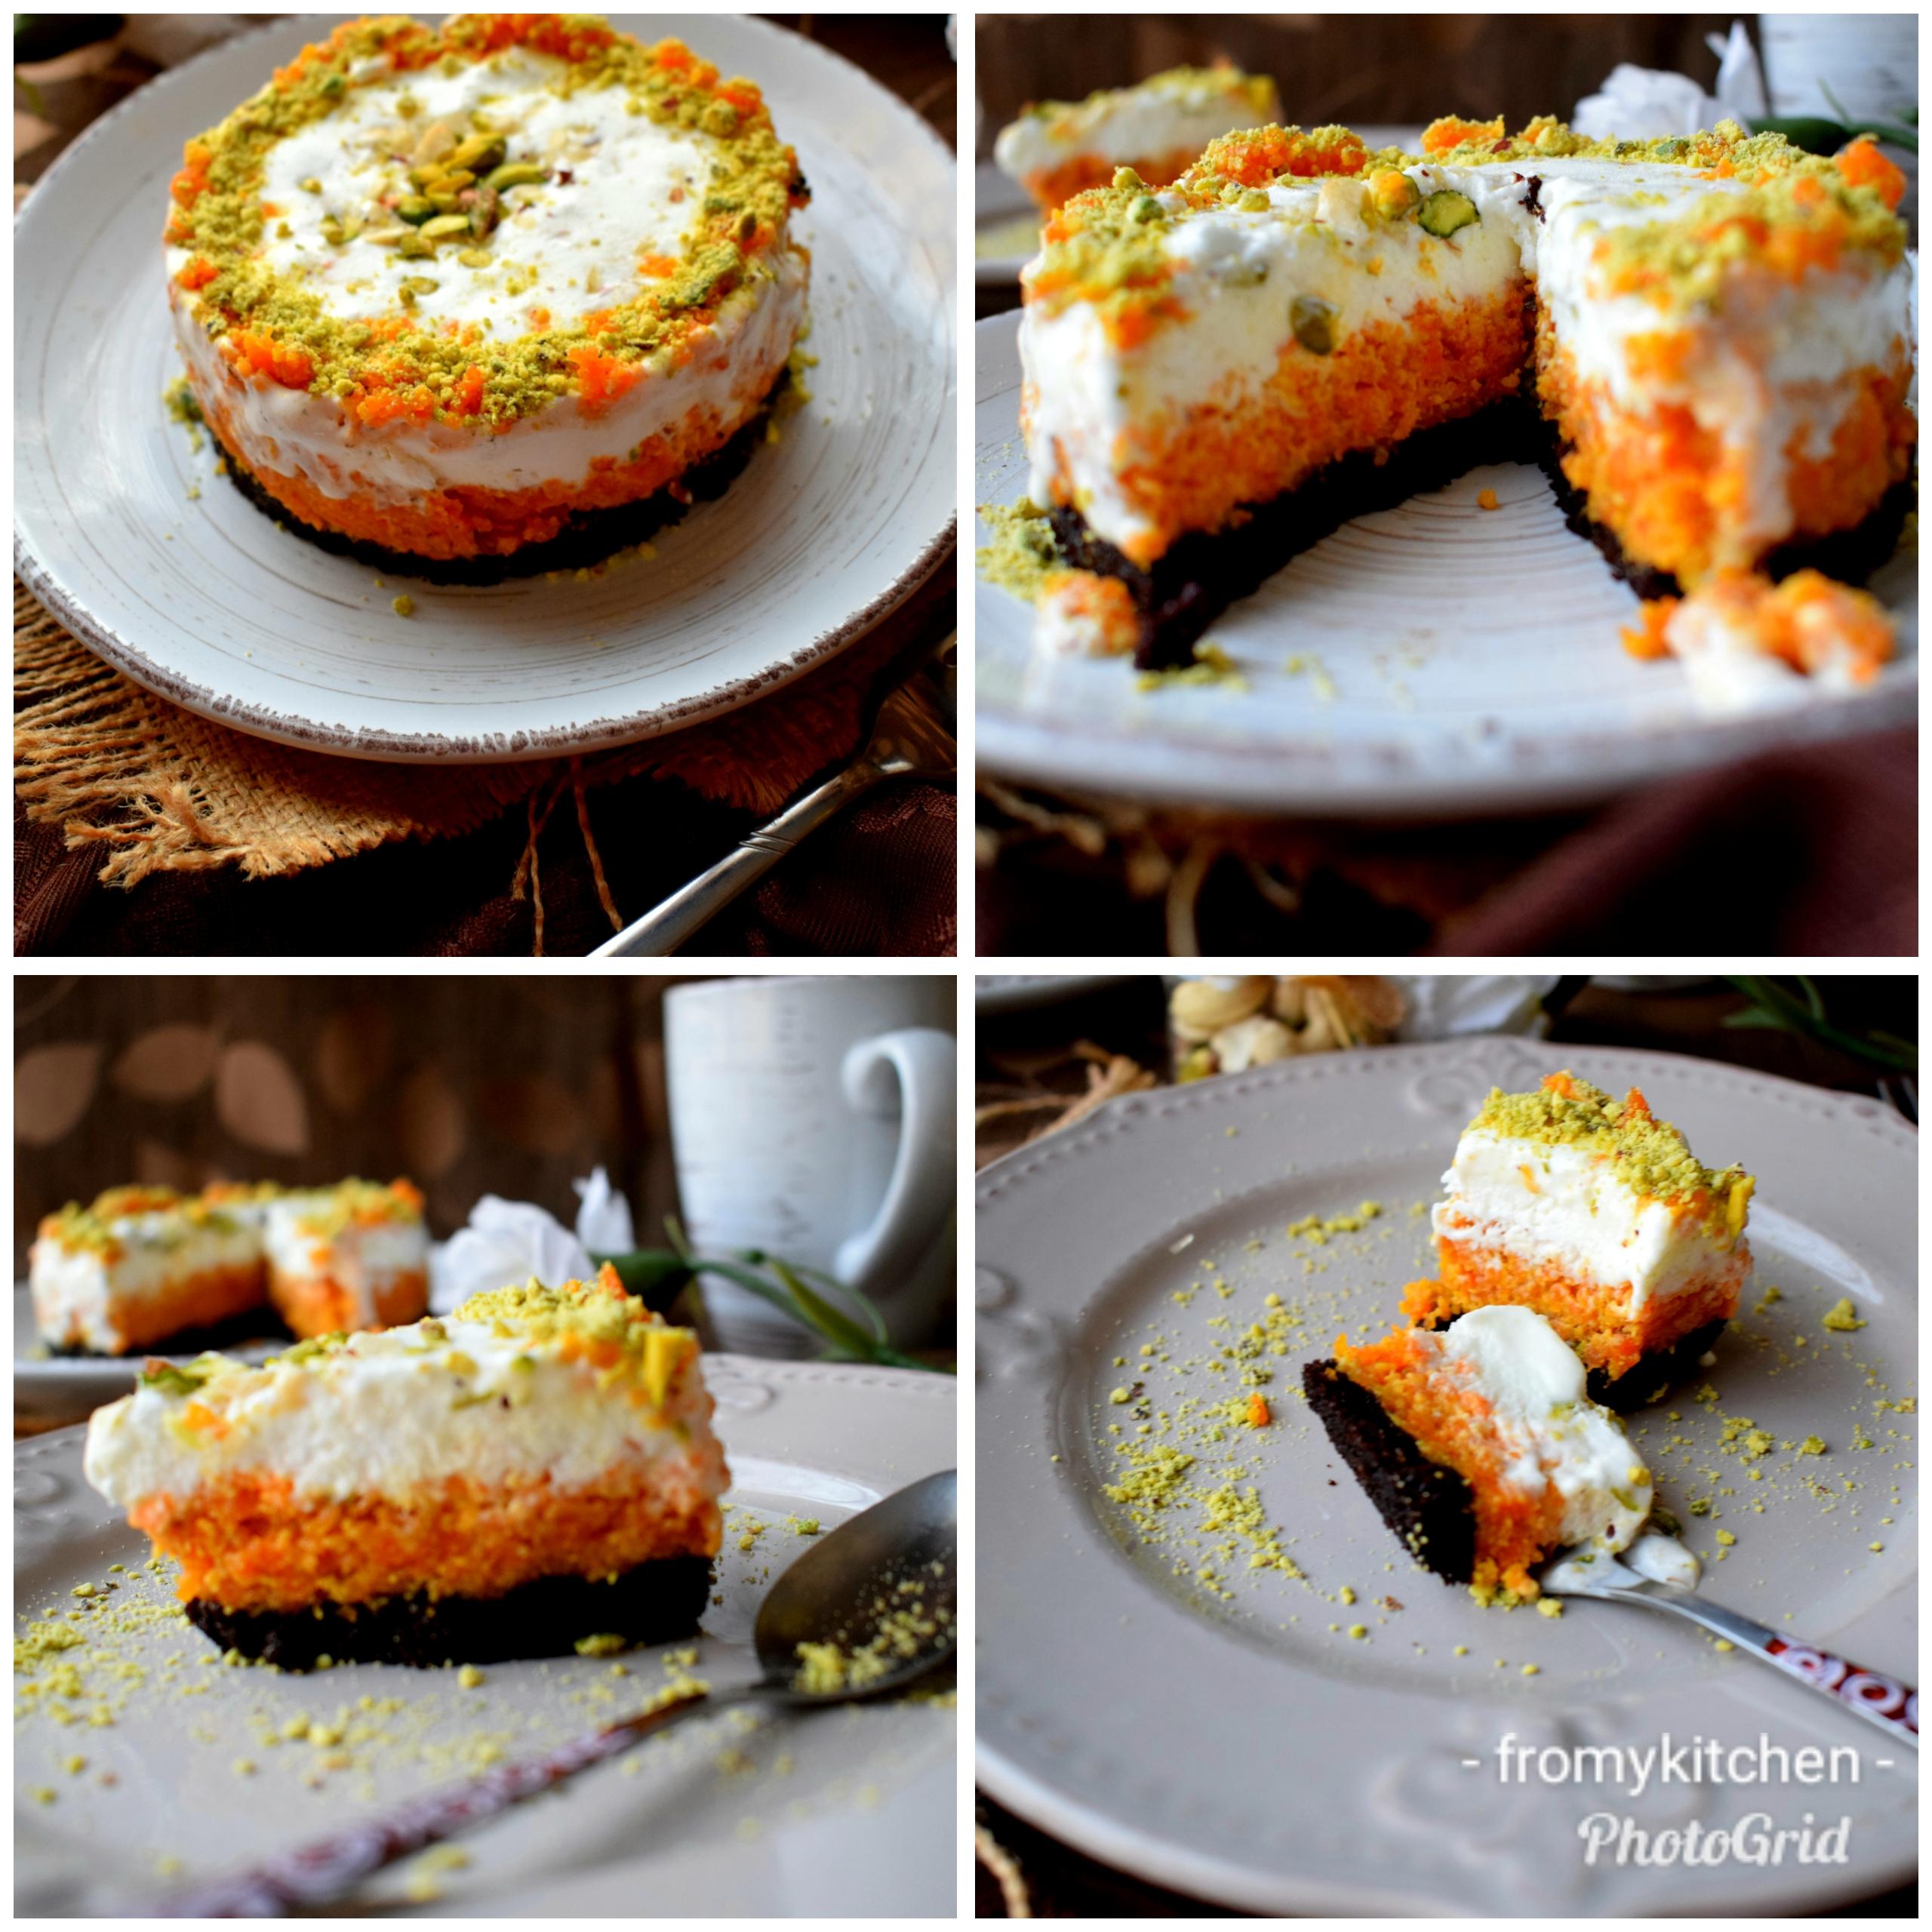 Chocolate & Carrot Halwa Icecream Cake - From My Kitchen